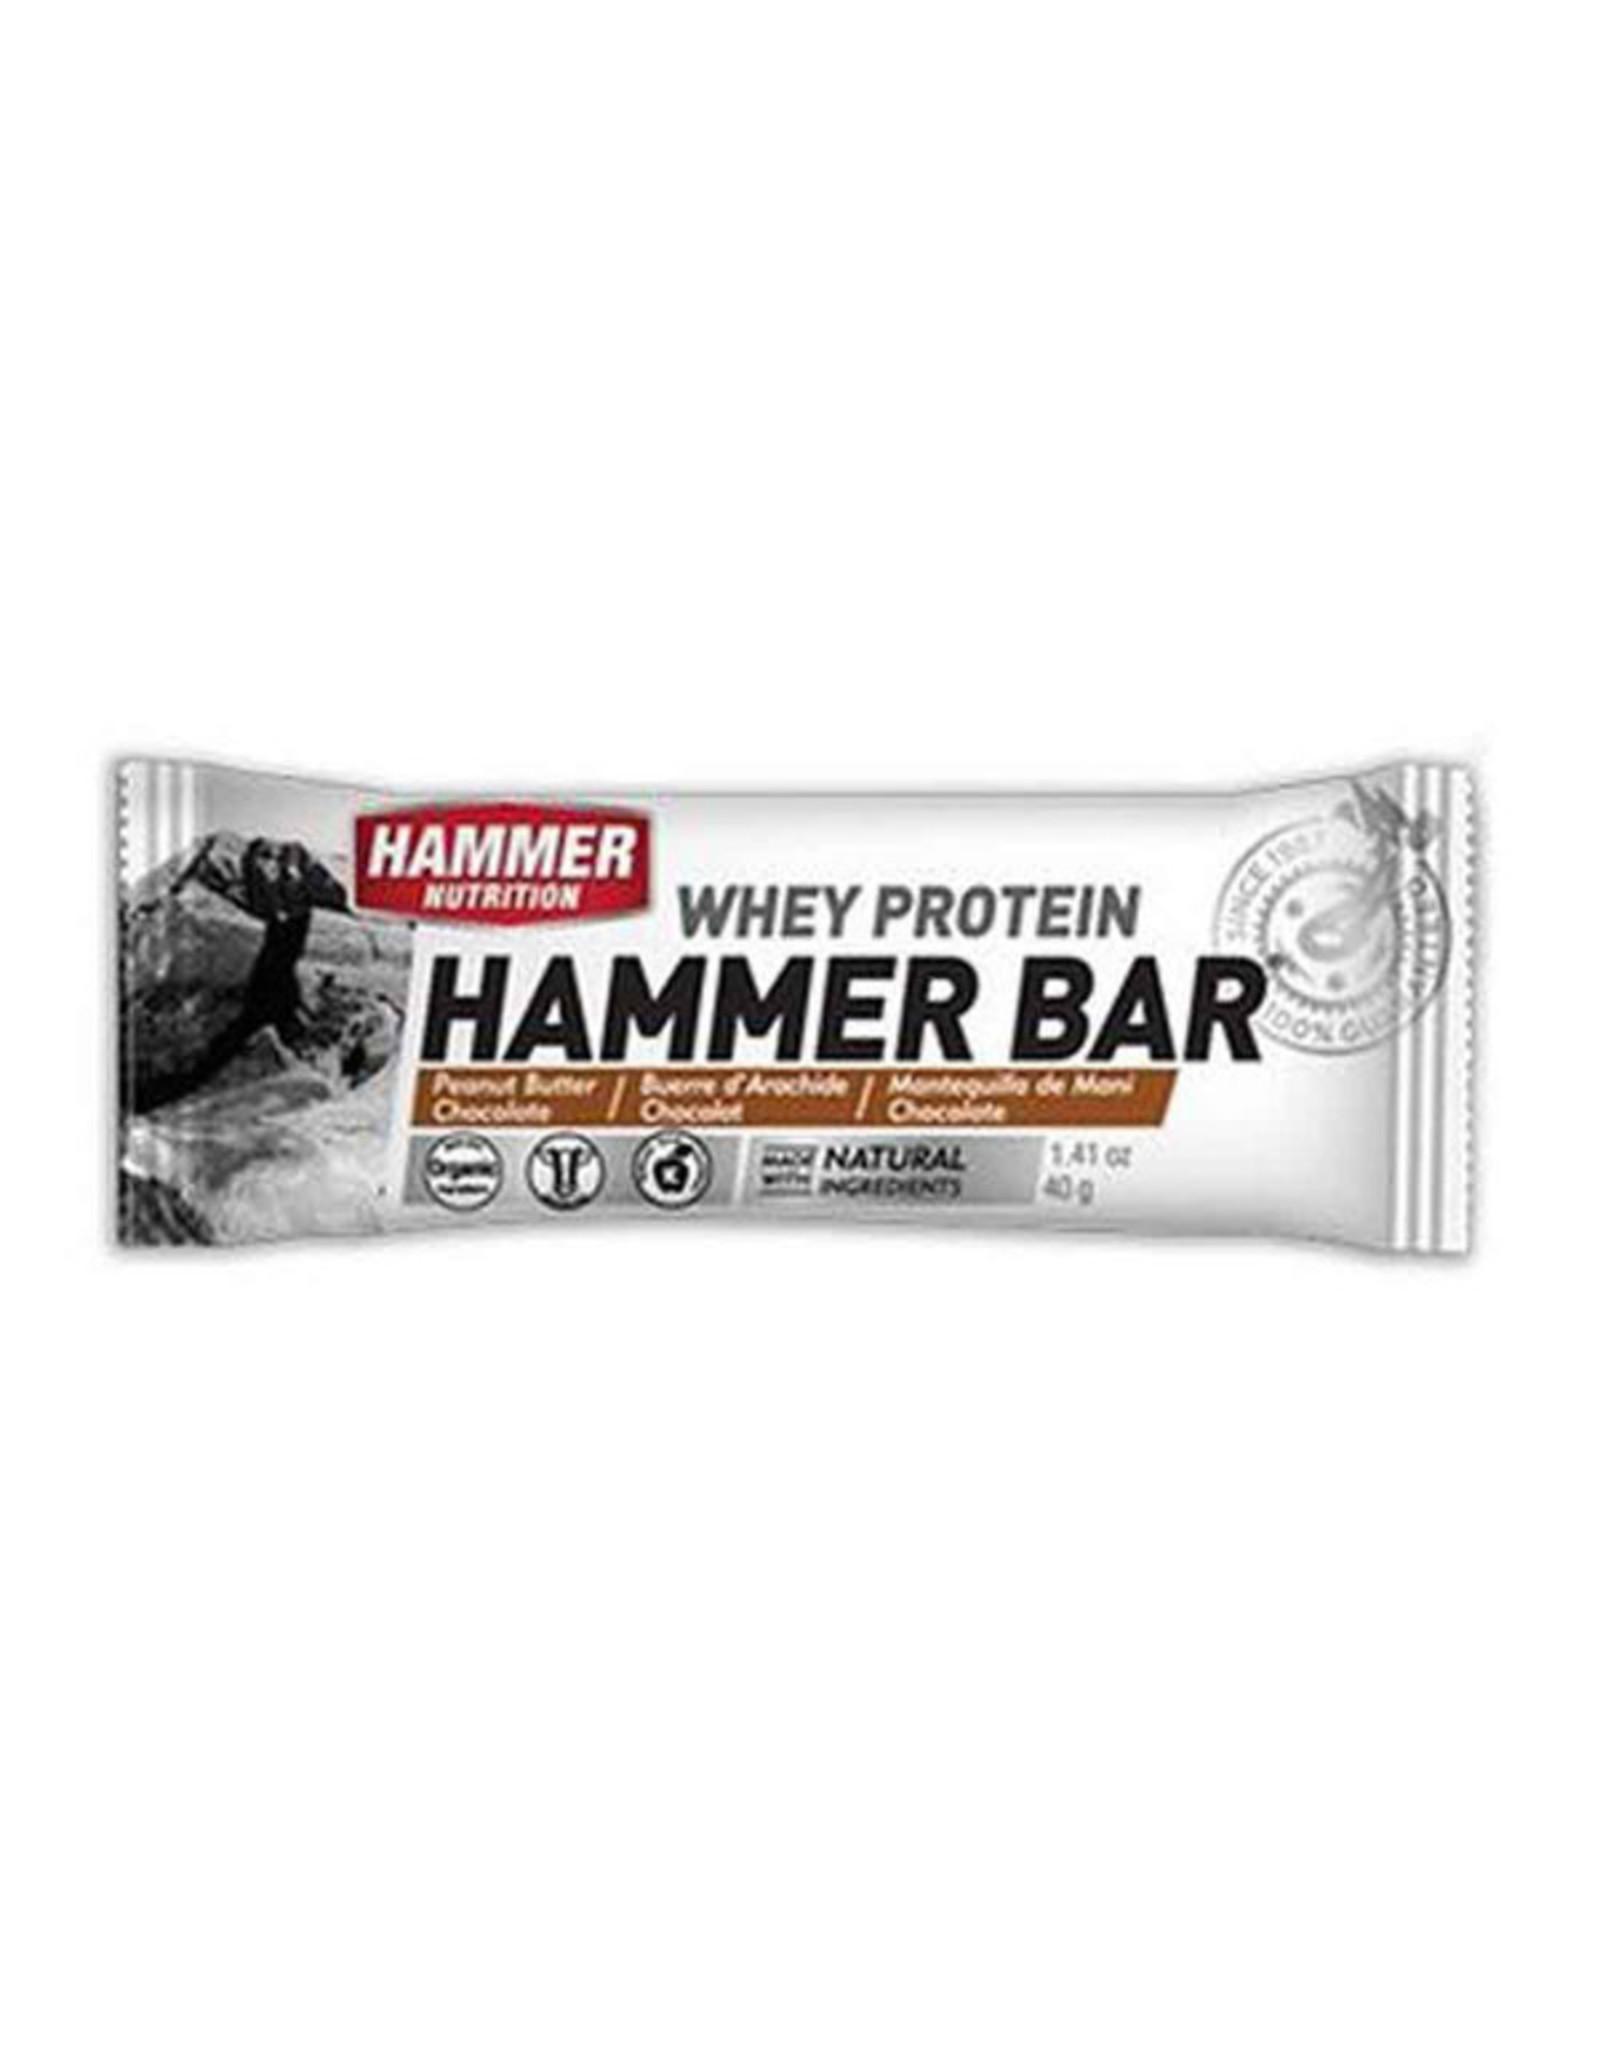 Hammer Nutrition Hammer Nutrition Whey Protein Bar 12 Pack